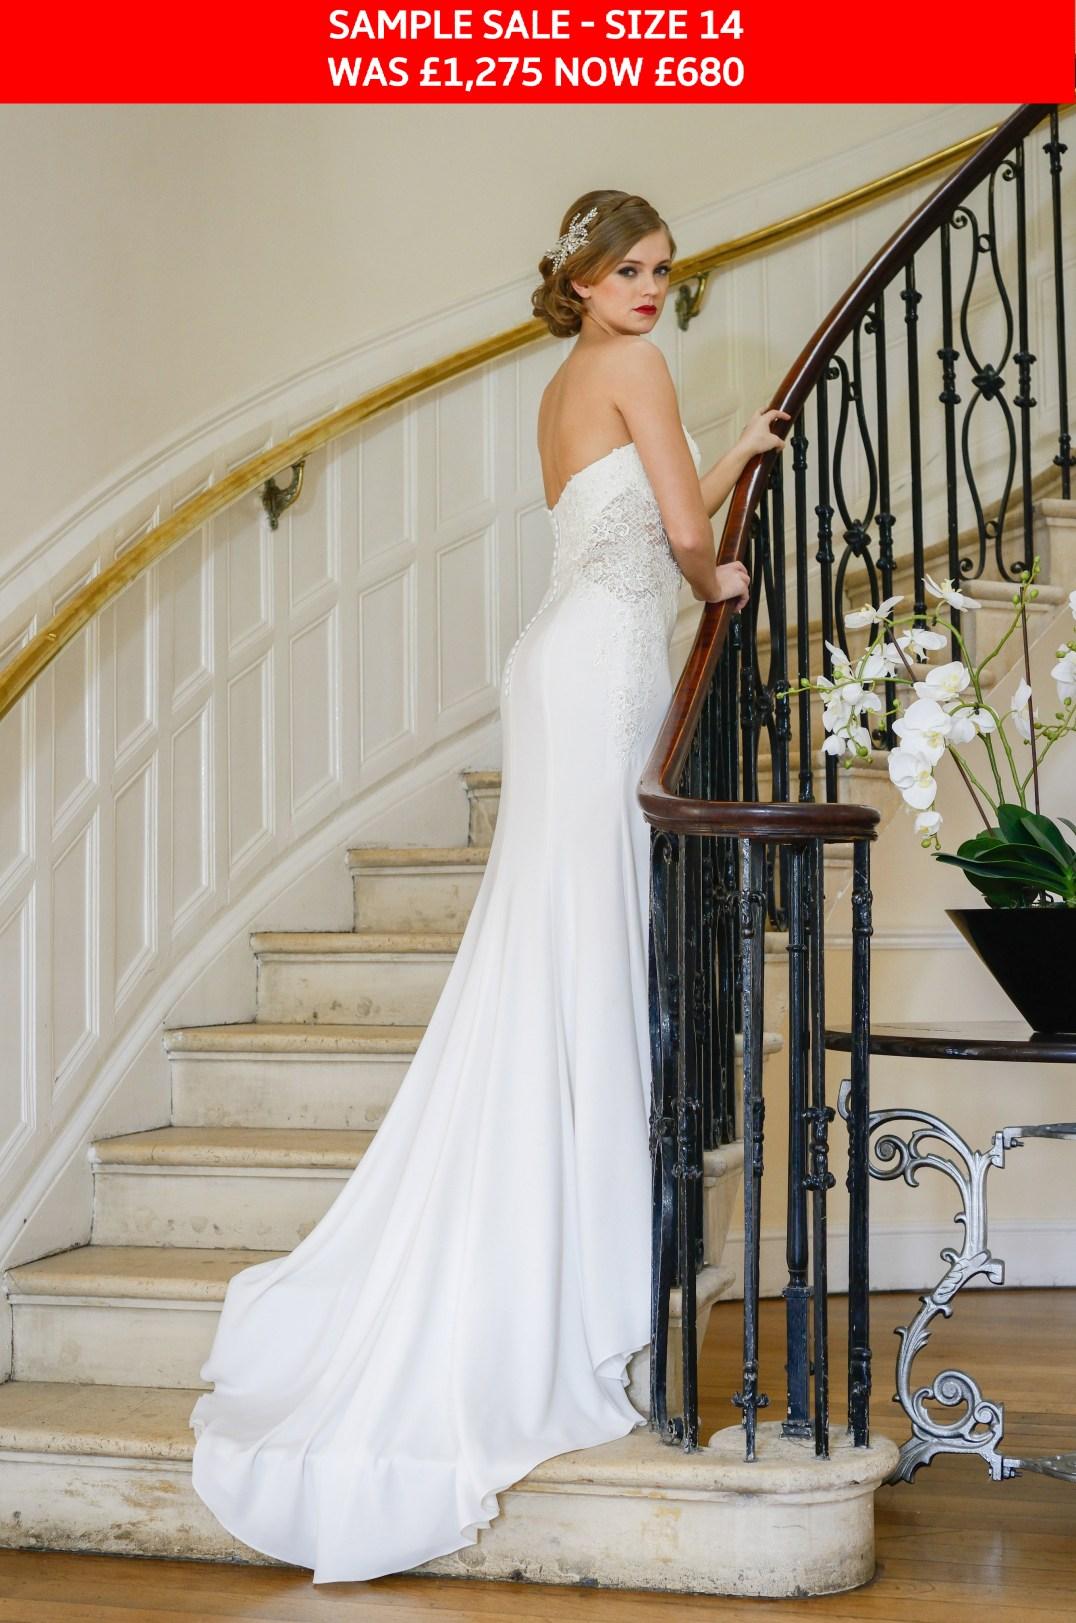 GAIA Nia wedding dress sample sale